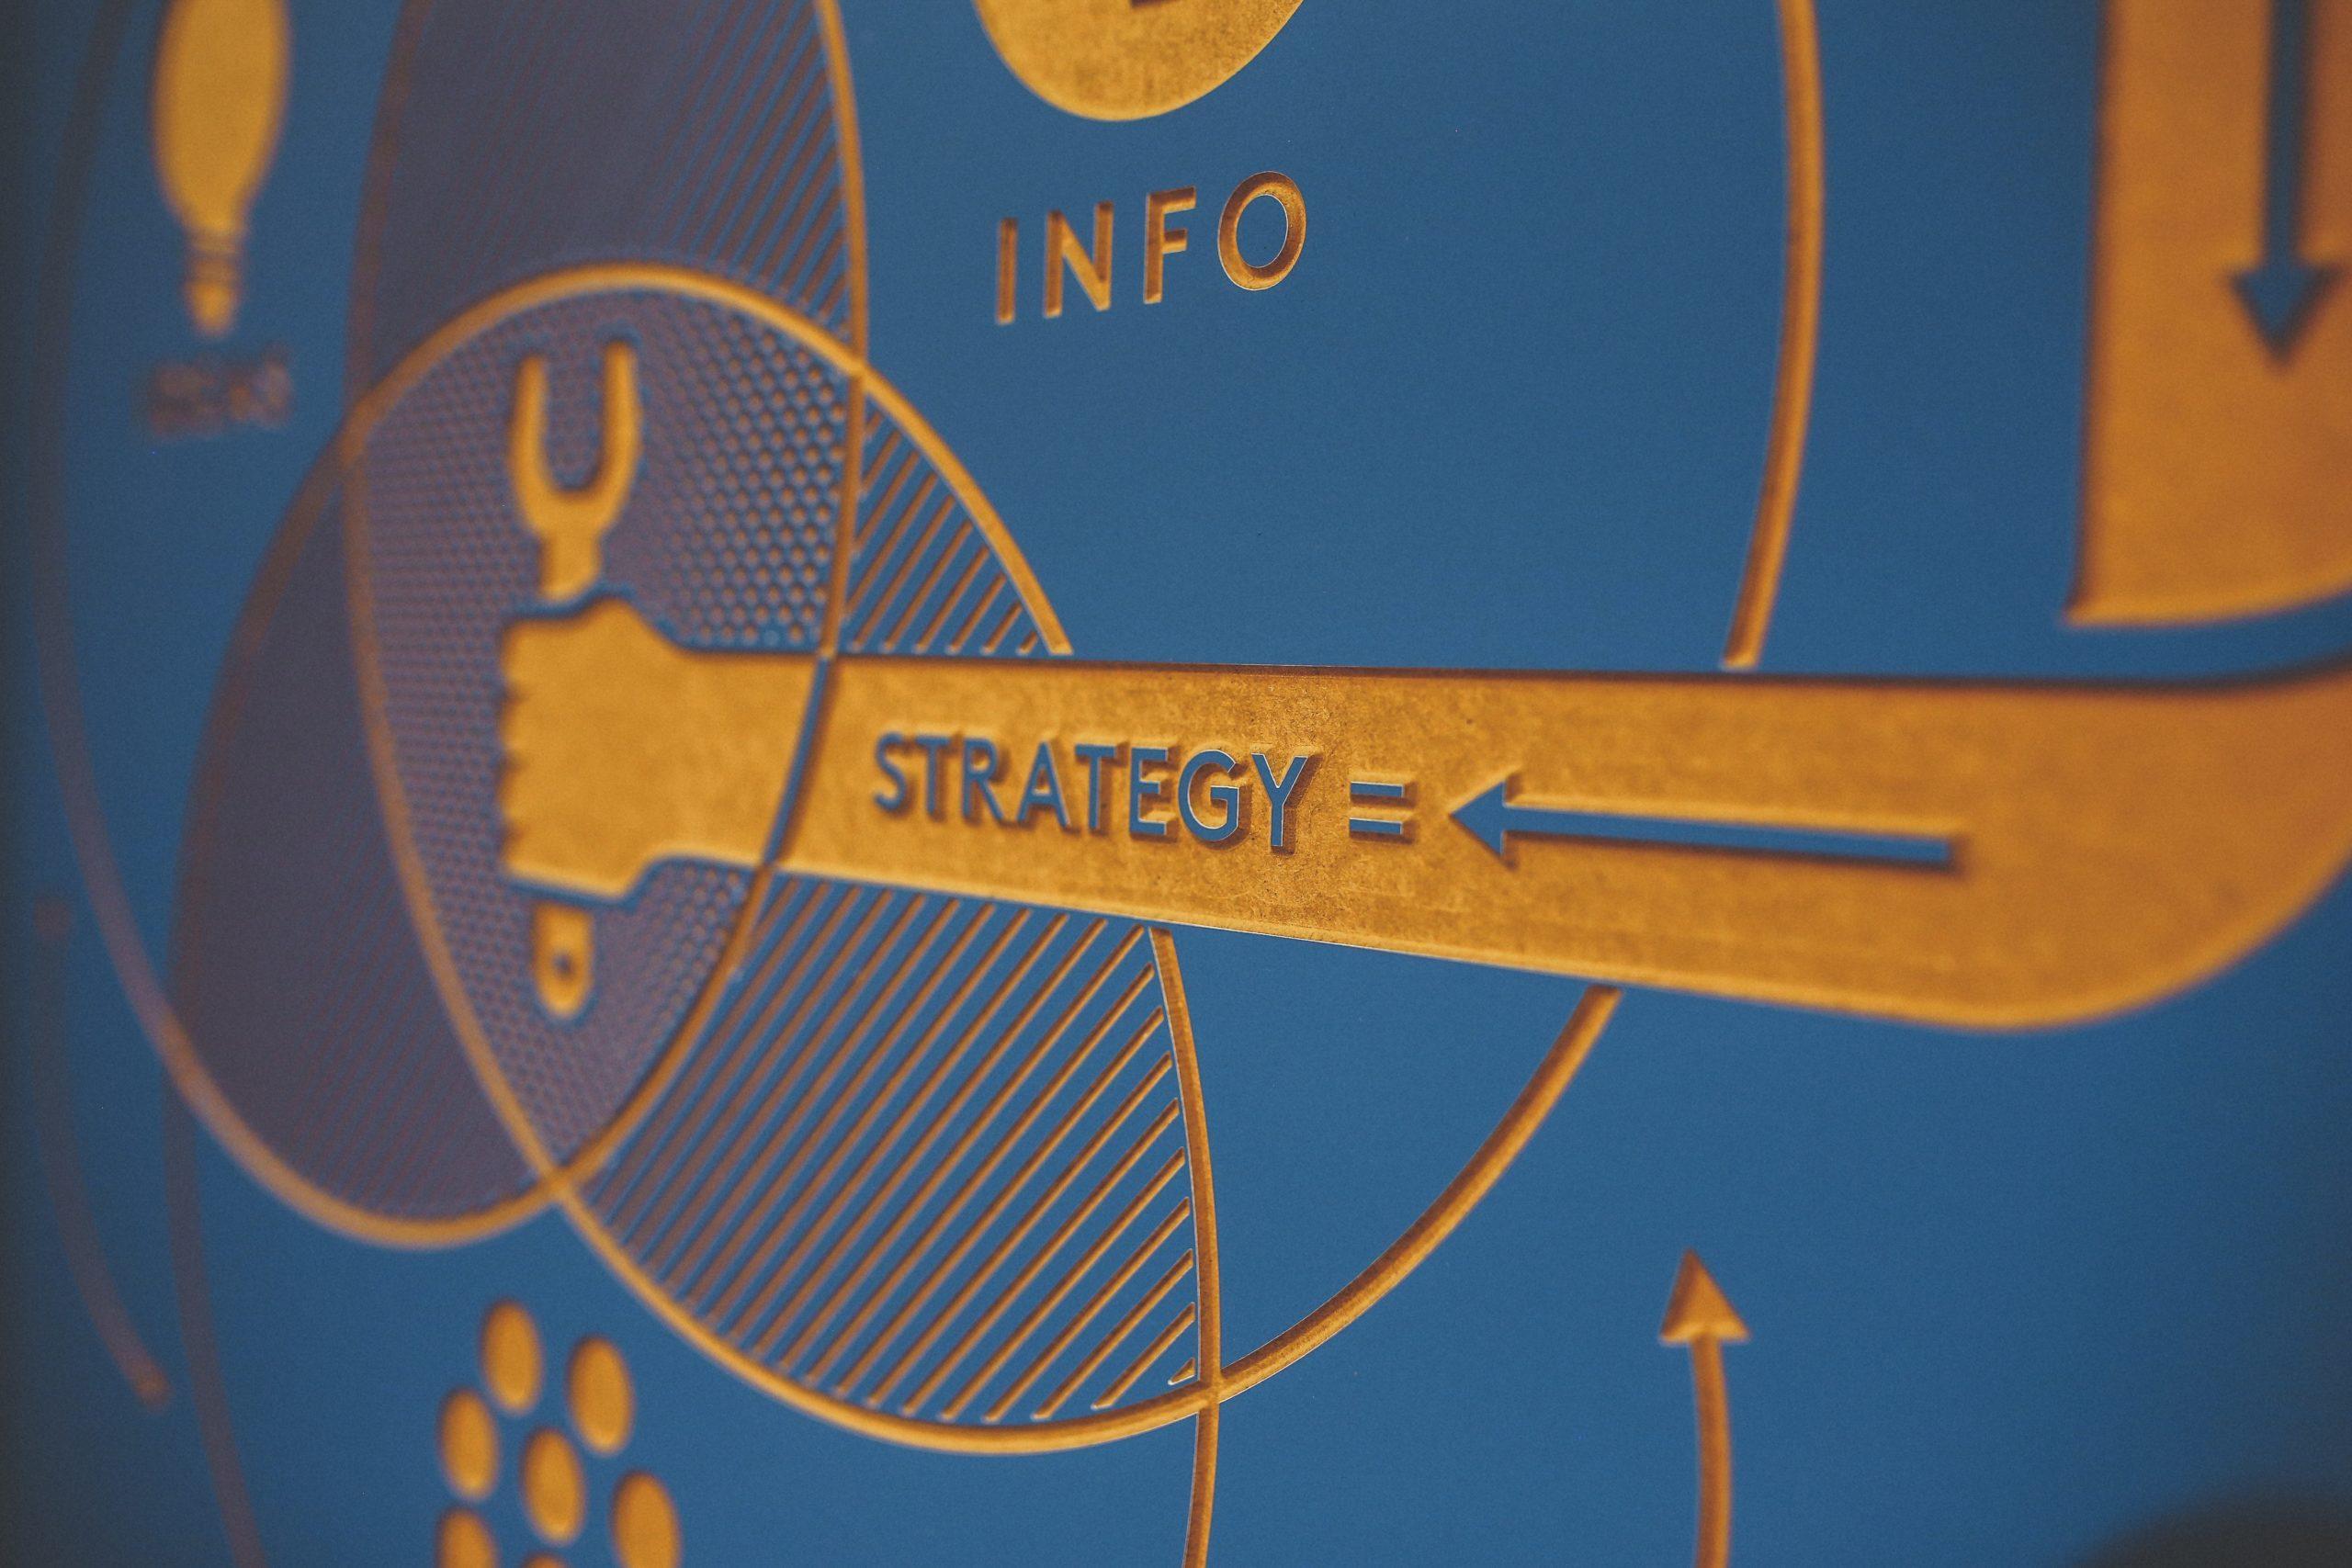 soigner sa communication photo : marketing ©Kaboompics via pexels